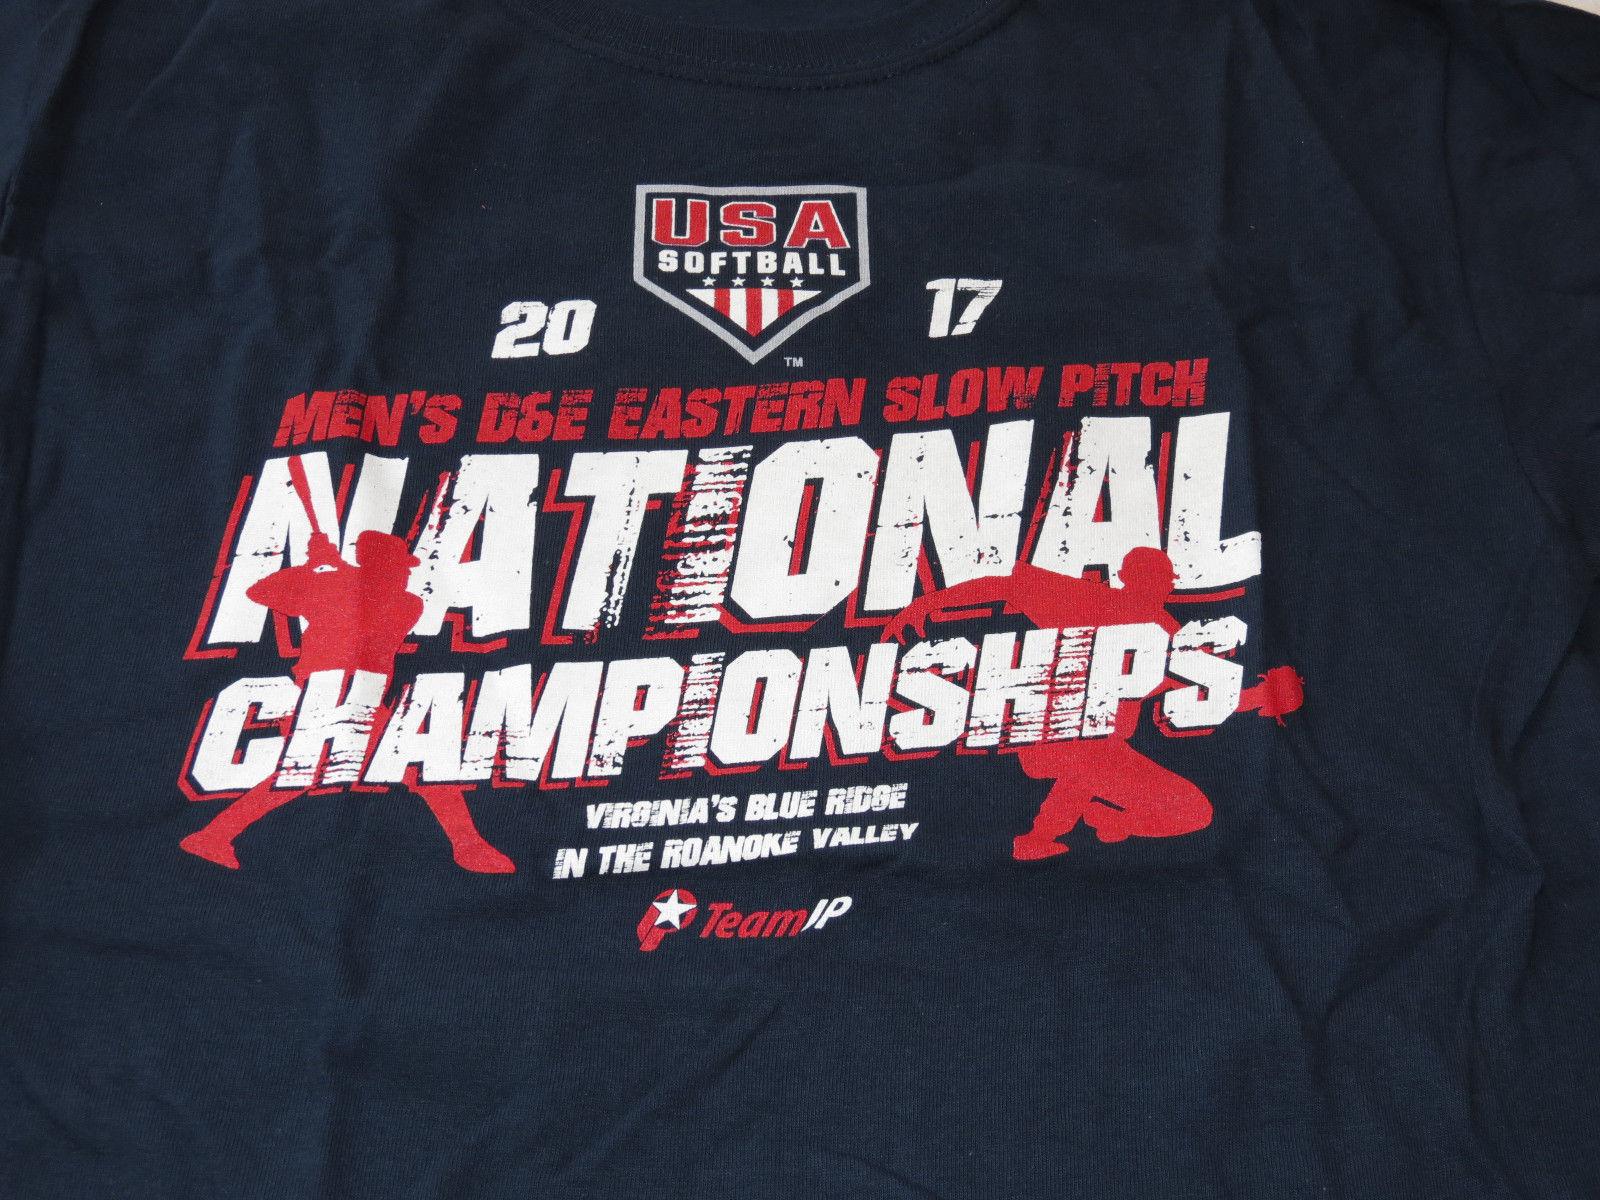 2017 National Championships USA softball Gildan Heavy Cotton S/S T shirt L Youth